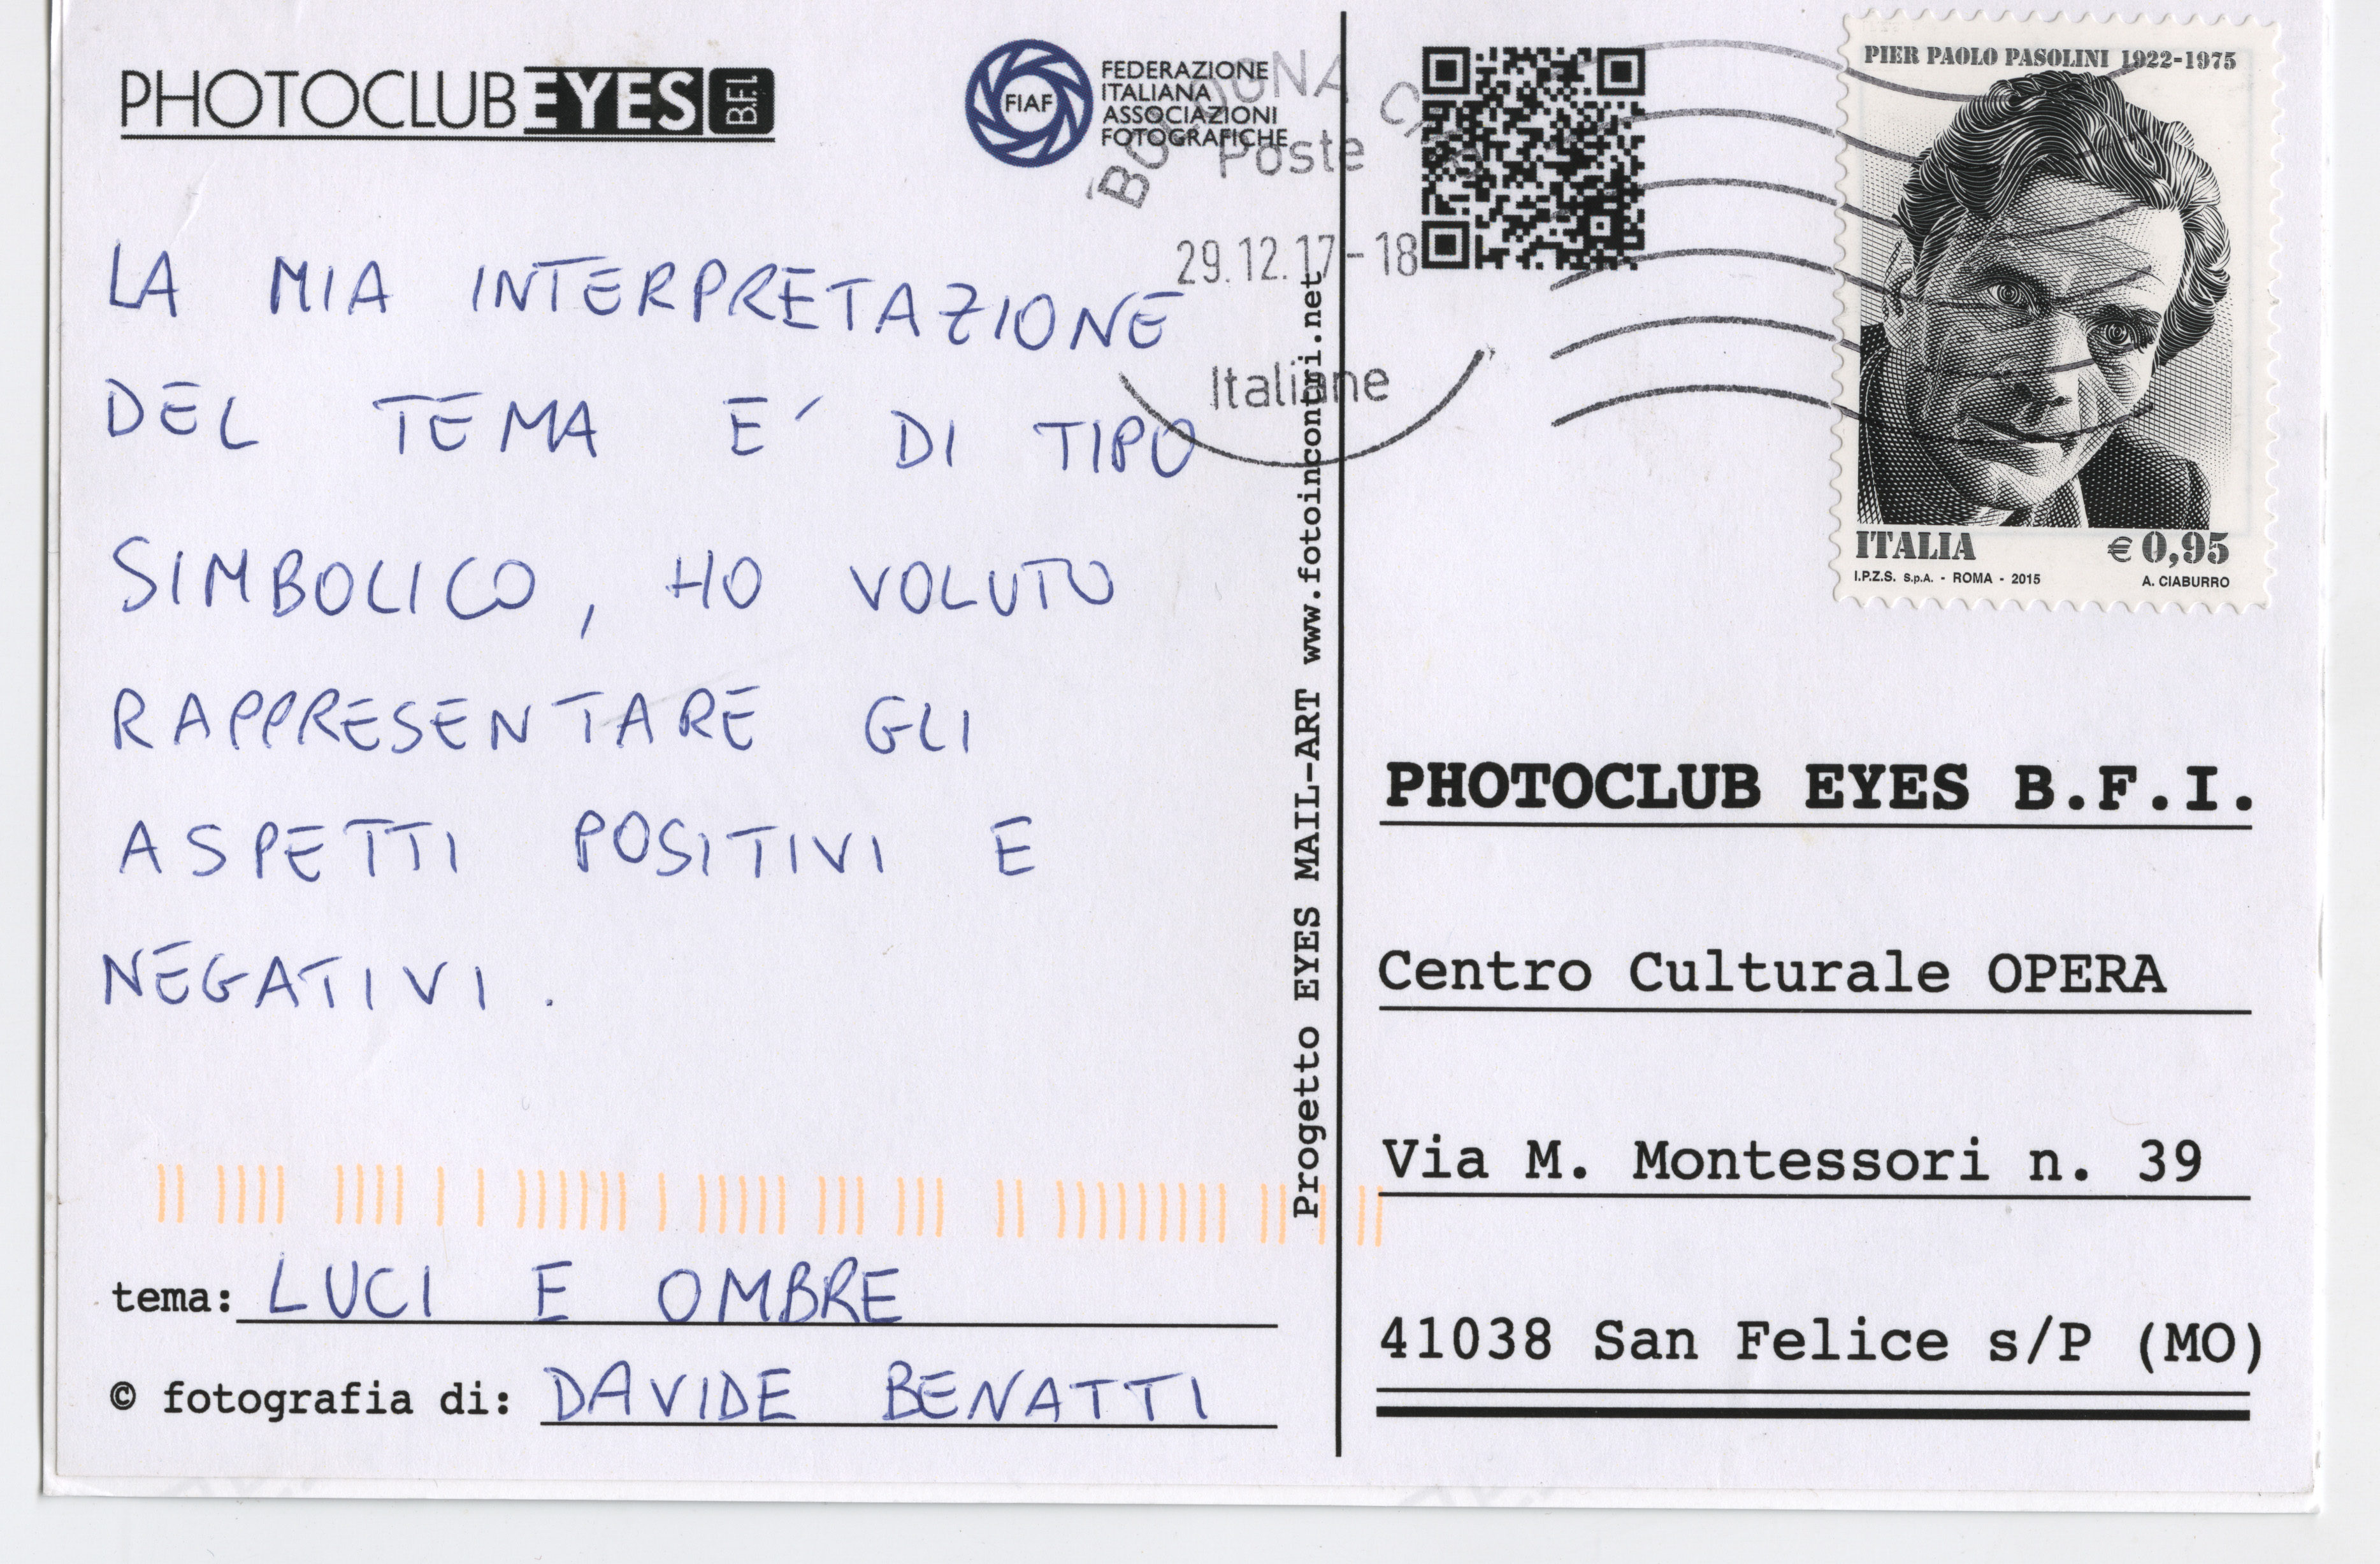 Davide Benatti